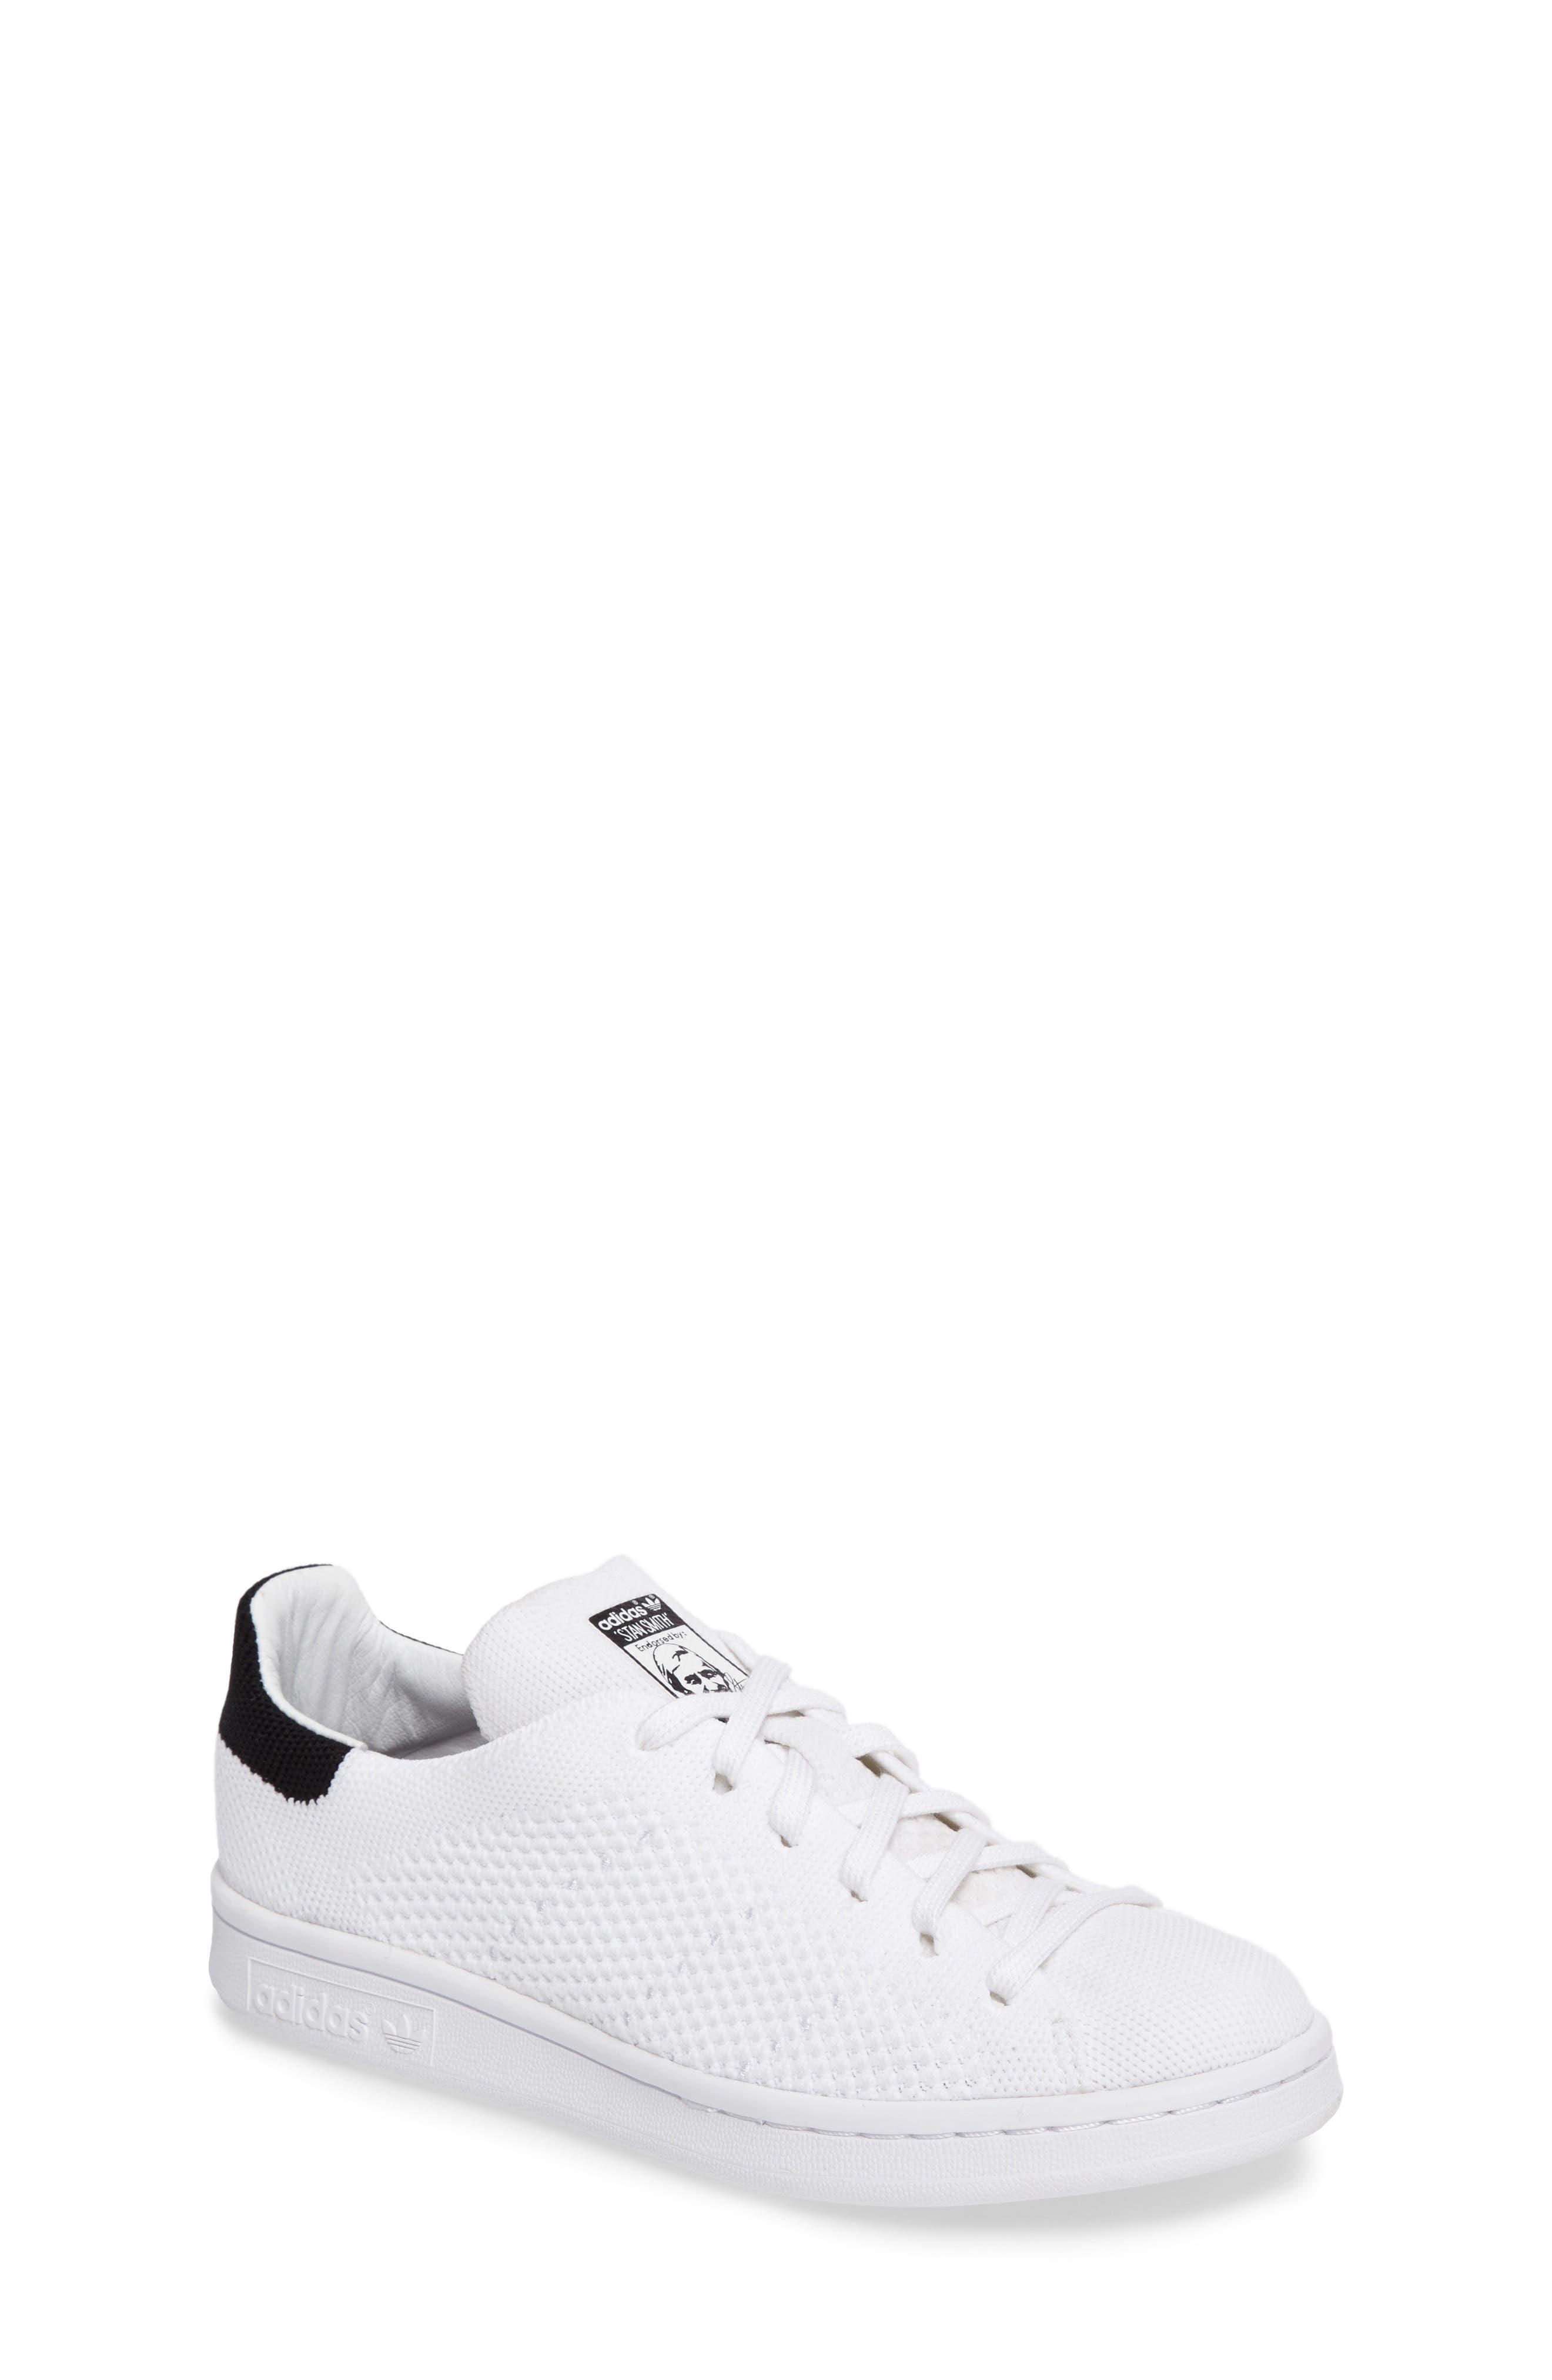 Main Image - adidas Stan Smith Primeknit Sneaker (Big Kid)